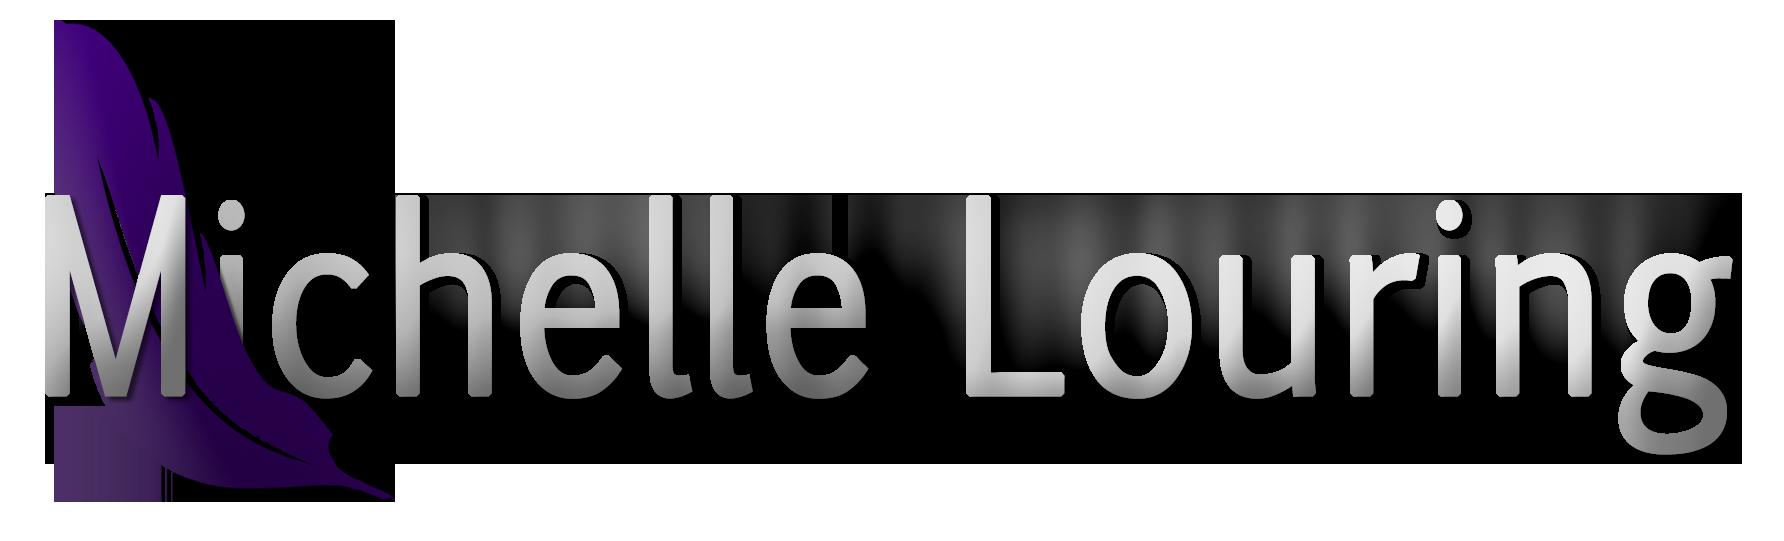 Michelle Louring header logo